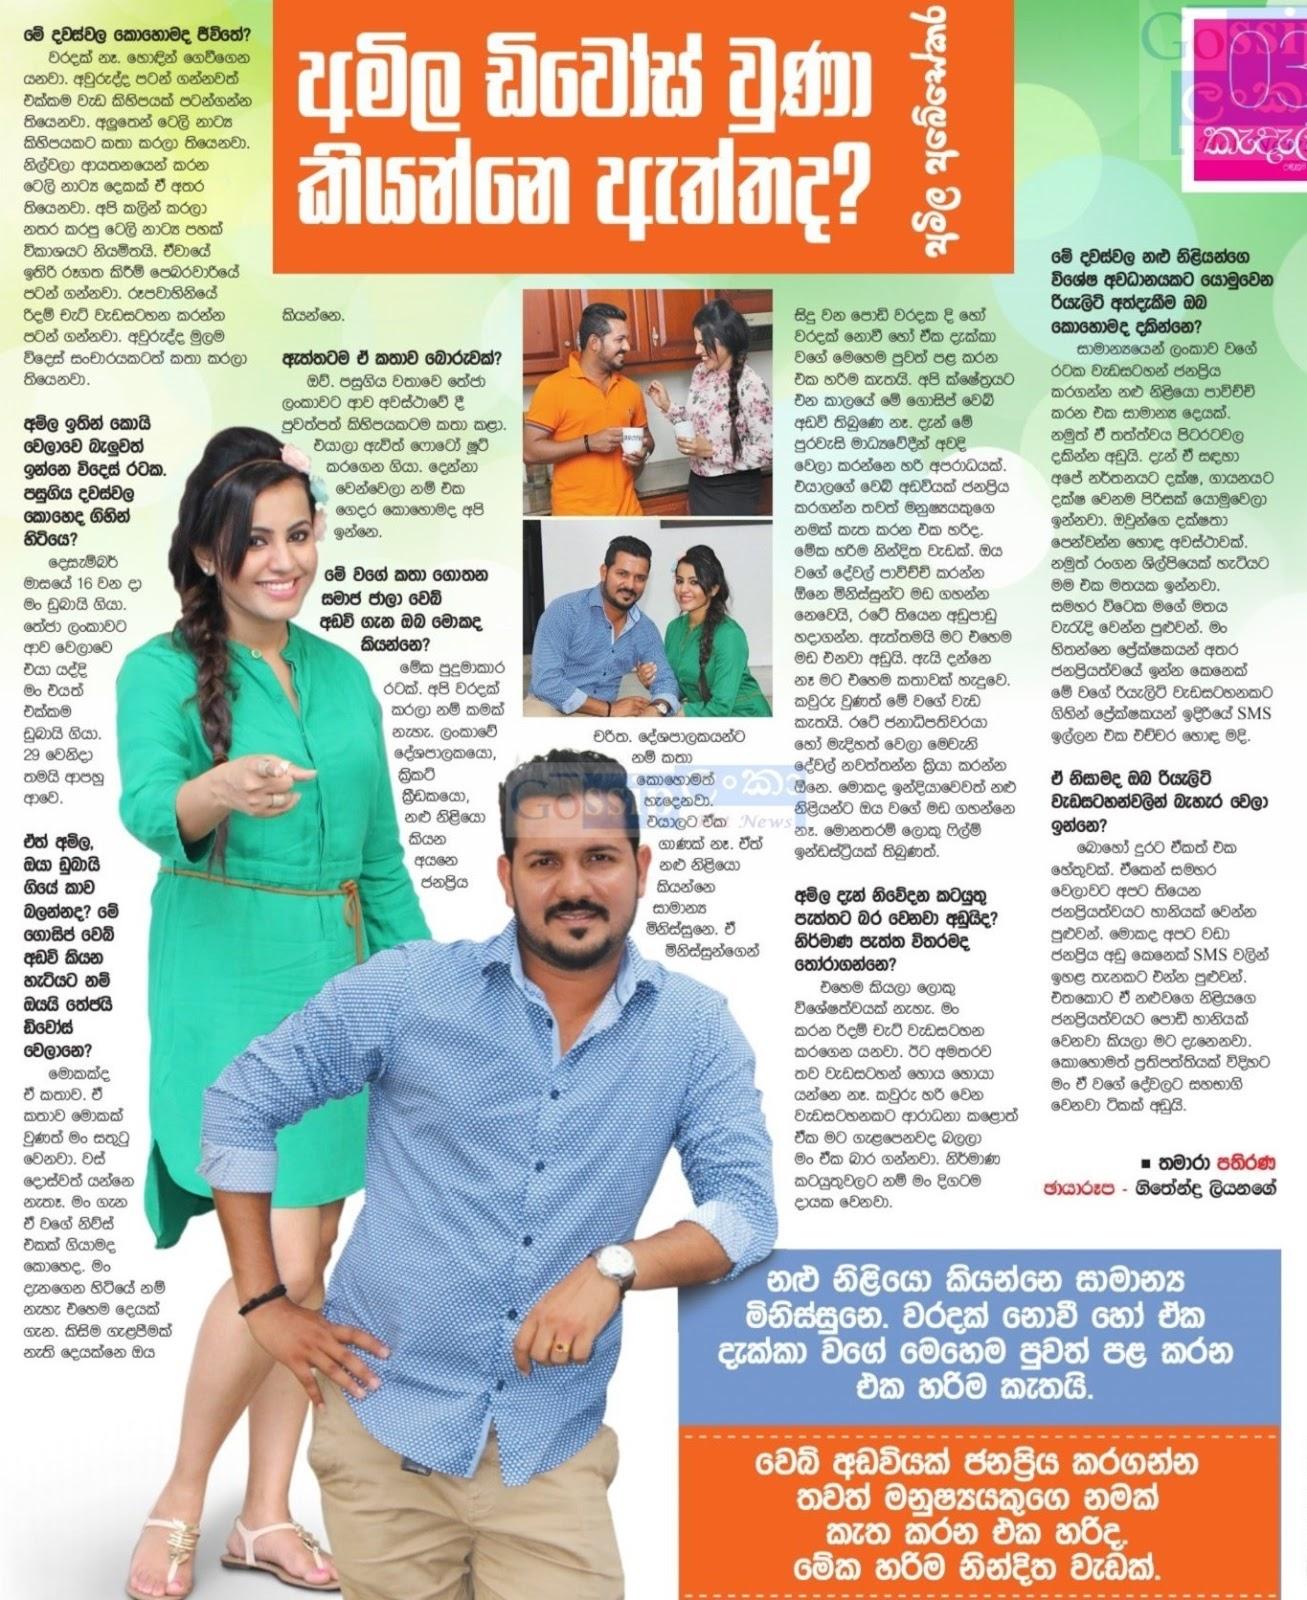 Gossip Chat with Amila Abeysekara - Gossip Lanka News   Hot Gossips